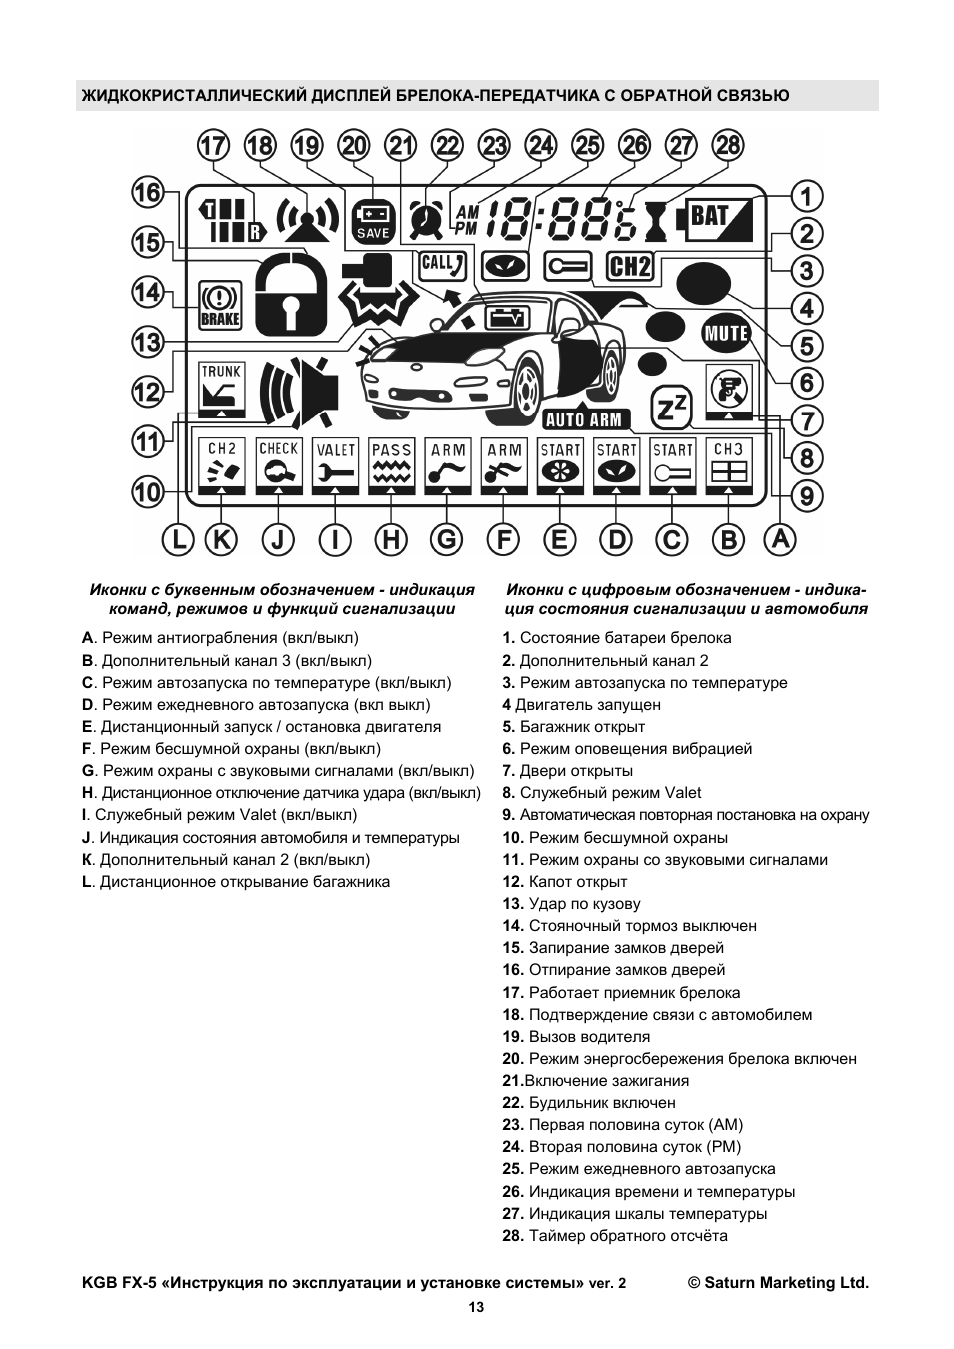 инструкция сигнализации кгб 8